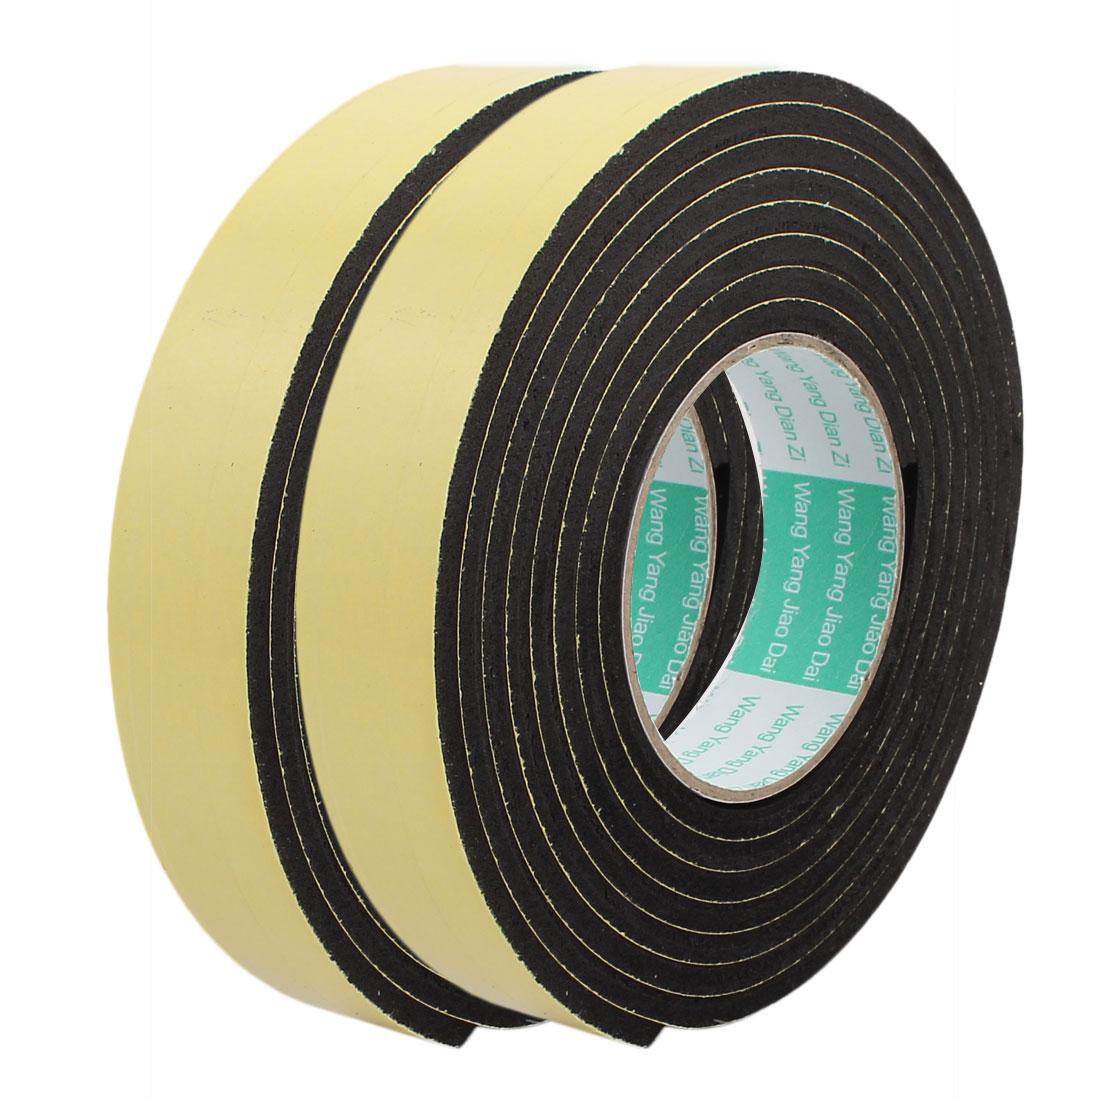 2pcs 3Meter 30mm x 5mm Single-side Adhesive Shockproof Sponge Foam Tape Yellow